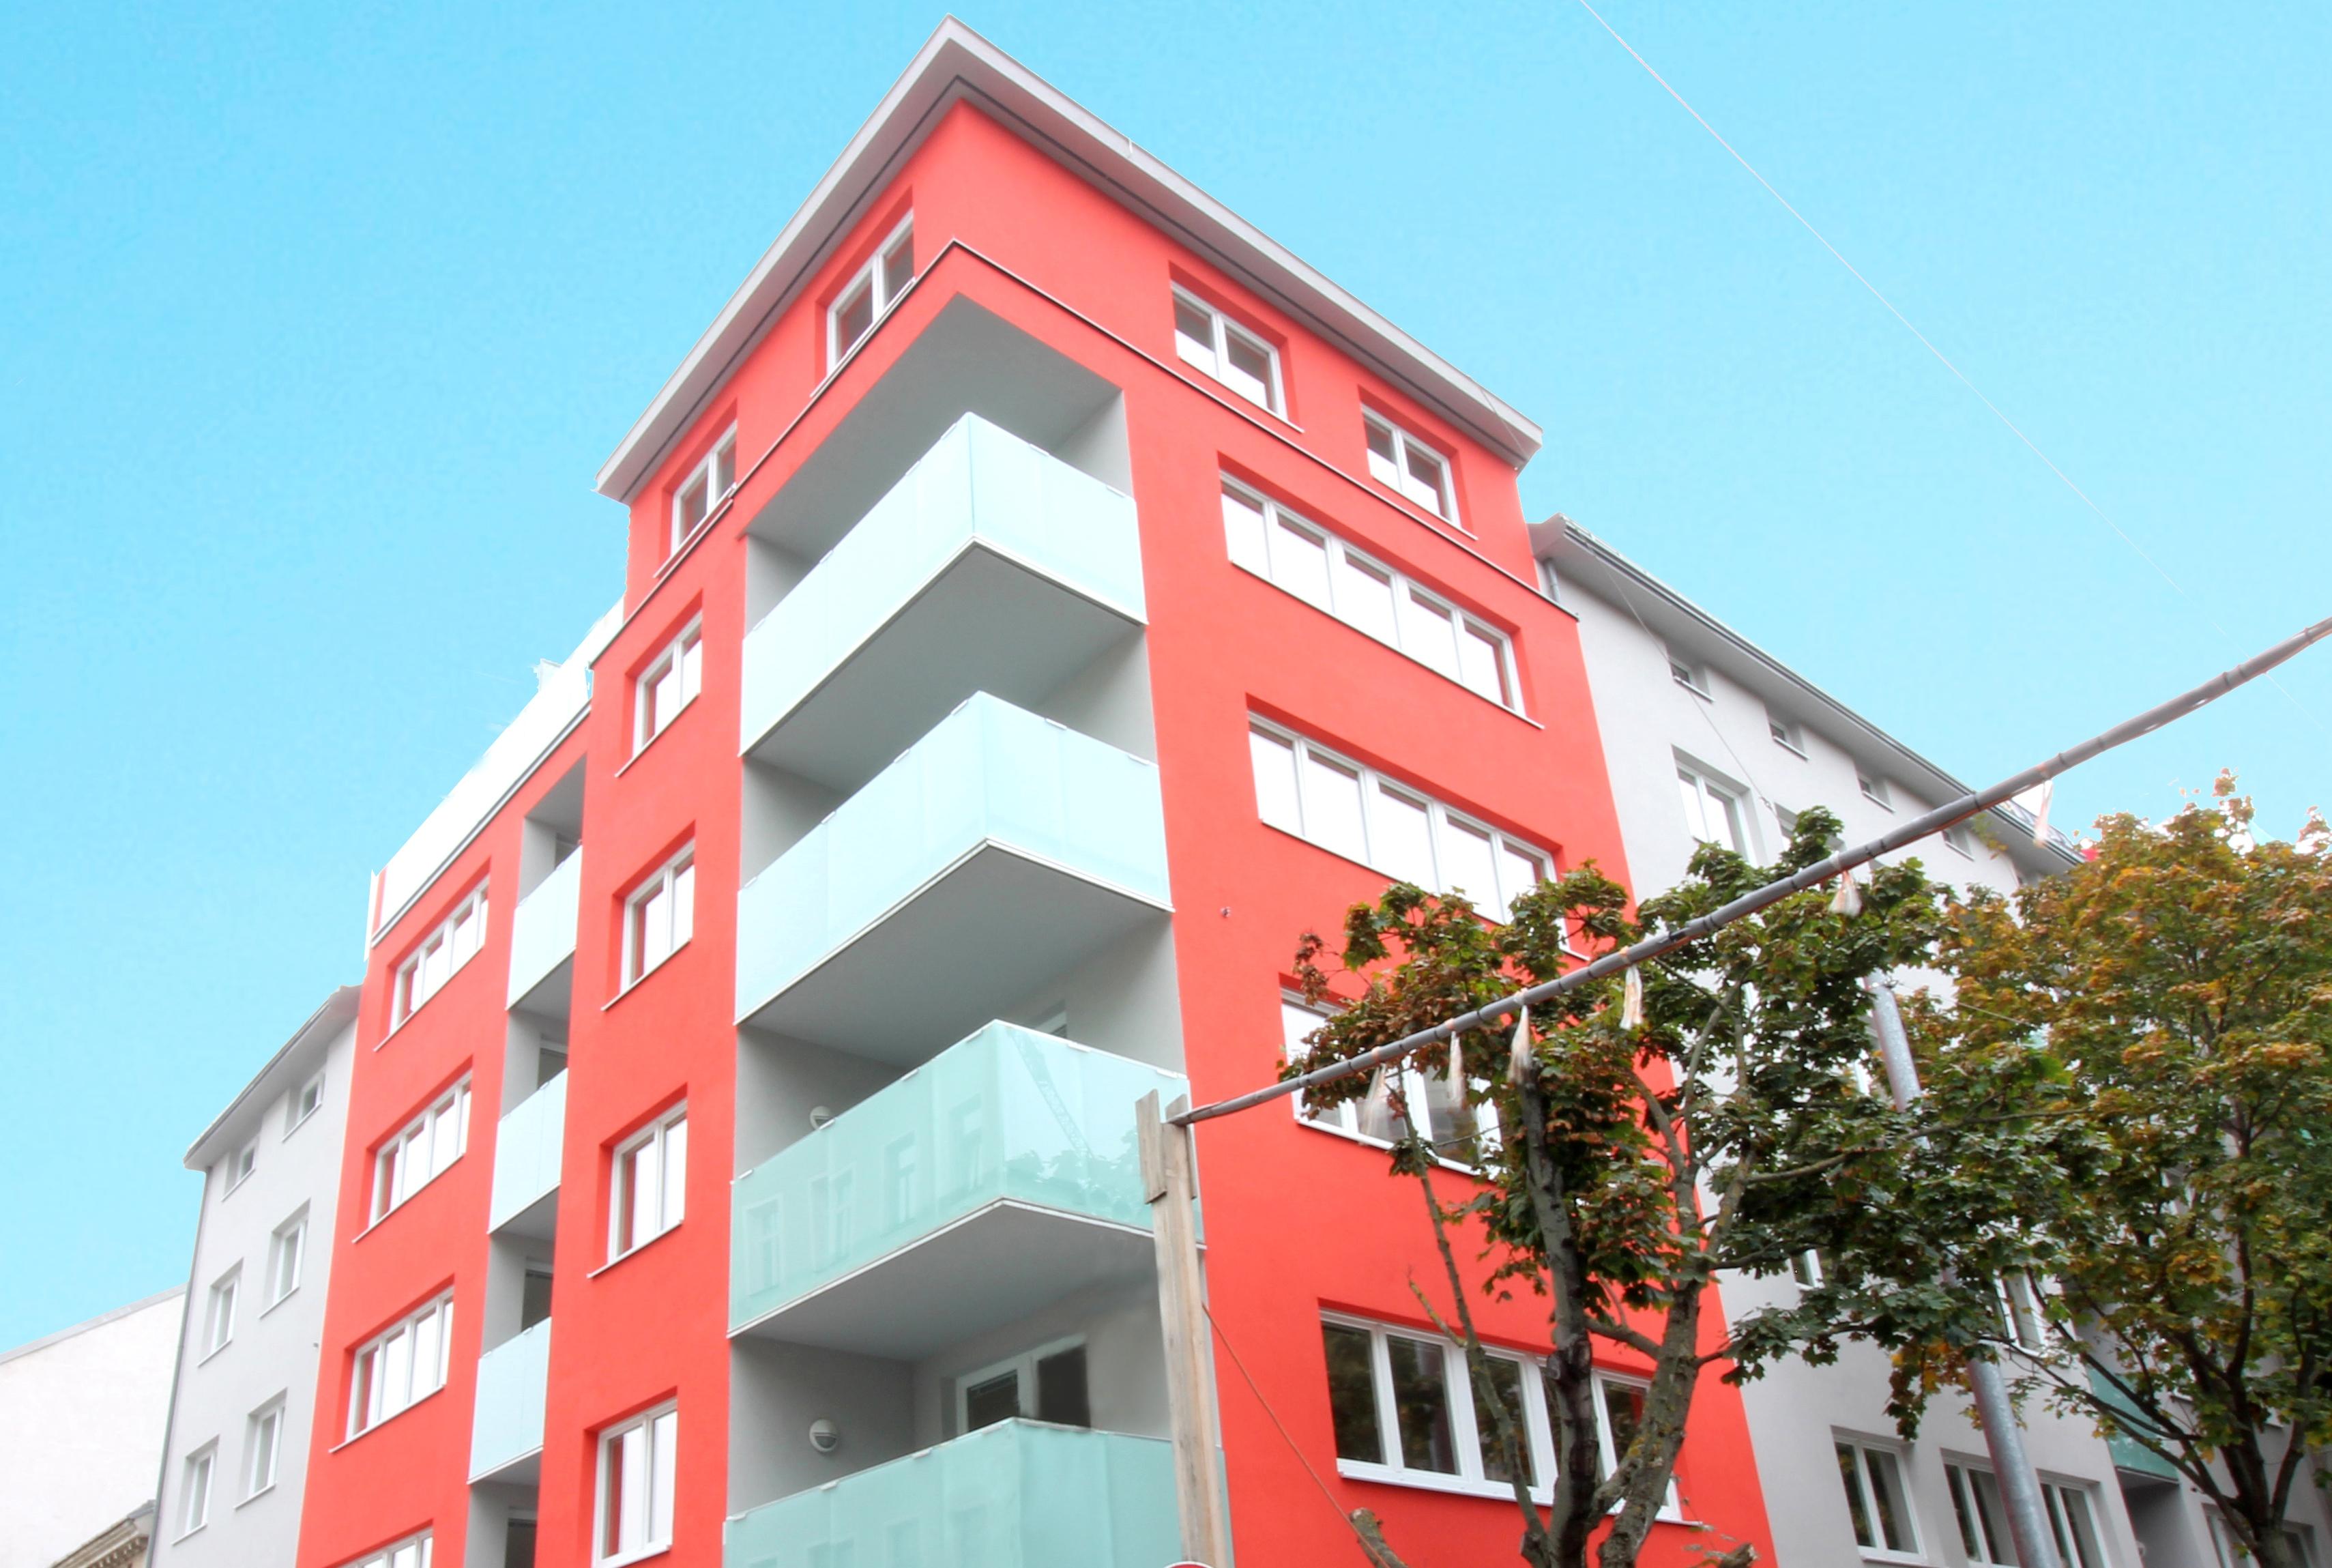 1140 Wien, Schützplatz